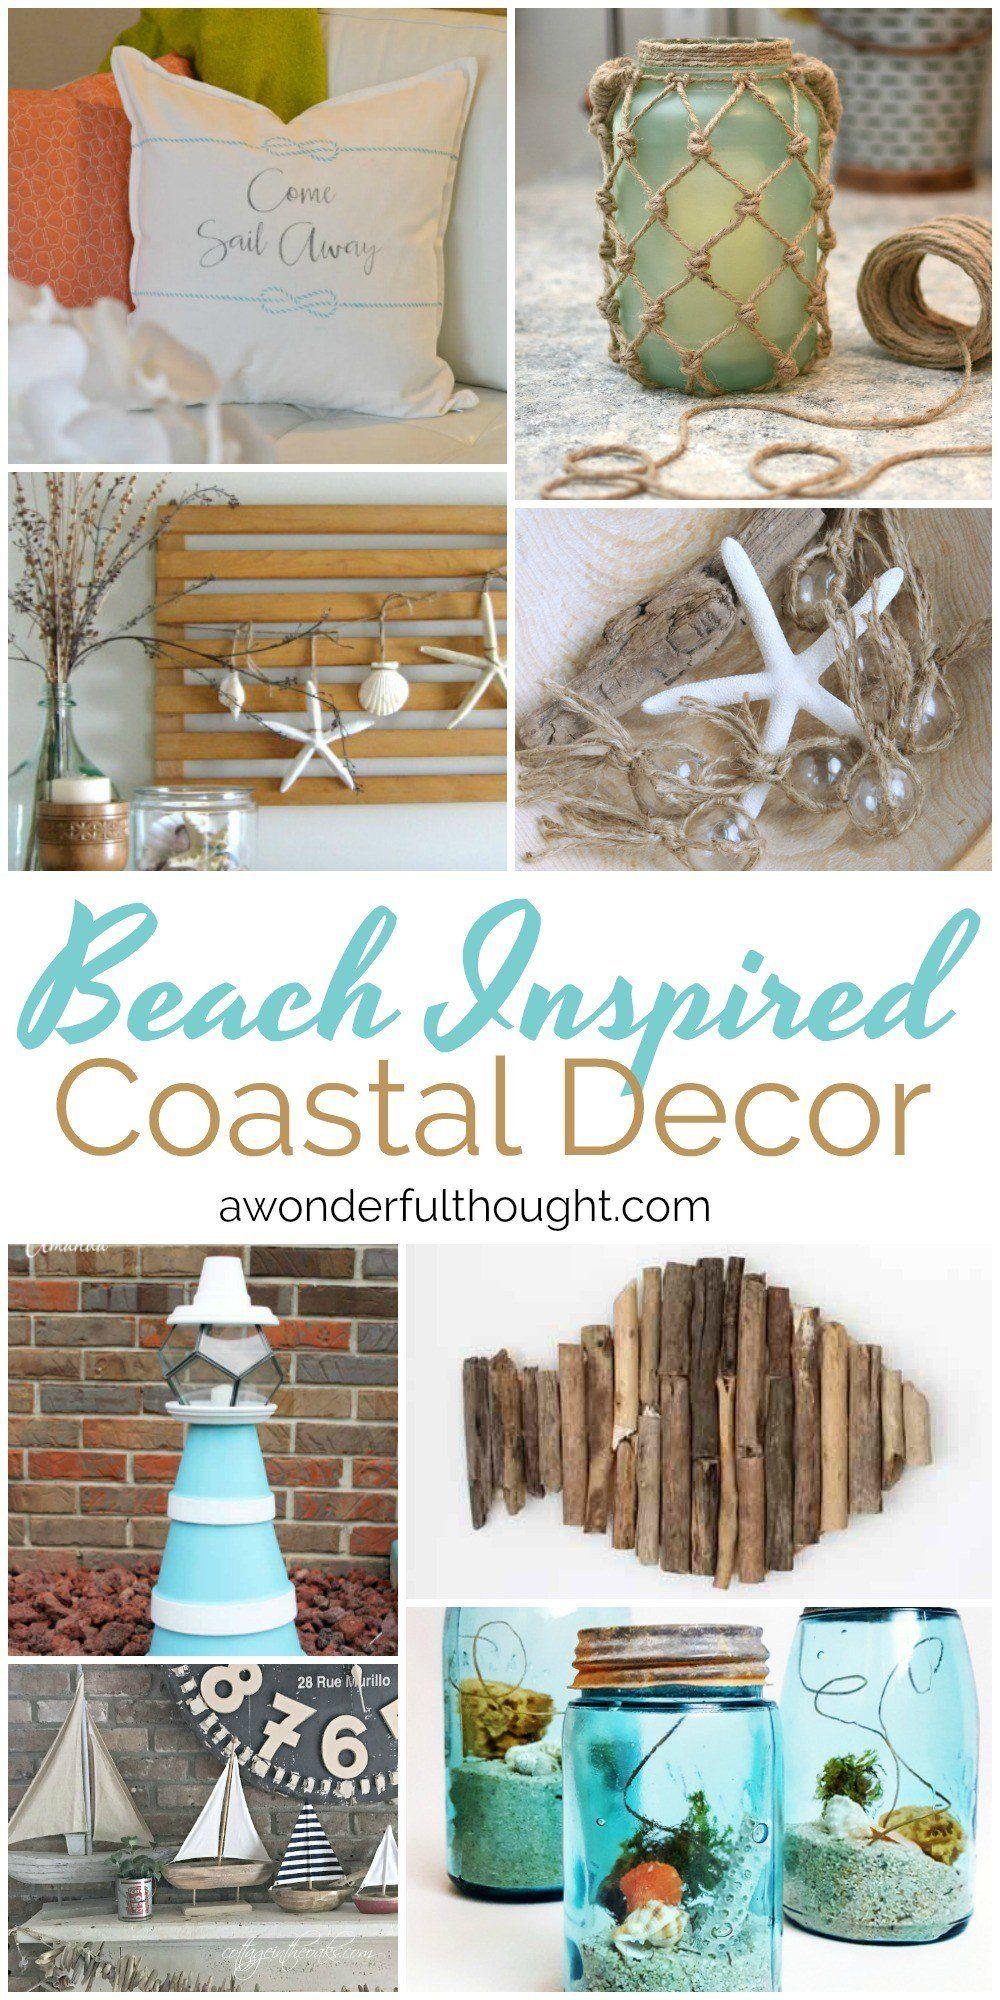 Beach Inspired Coastal Decor Ideas #247Moms